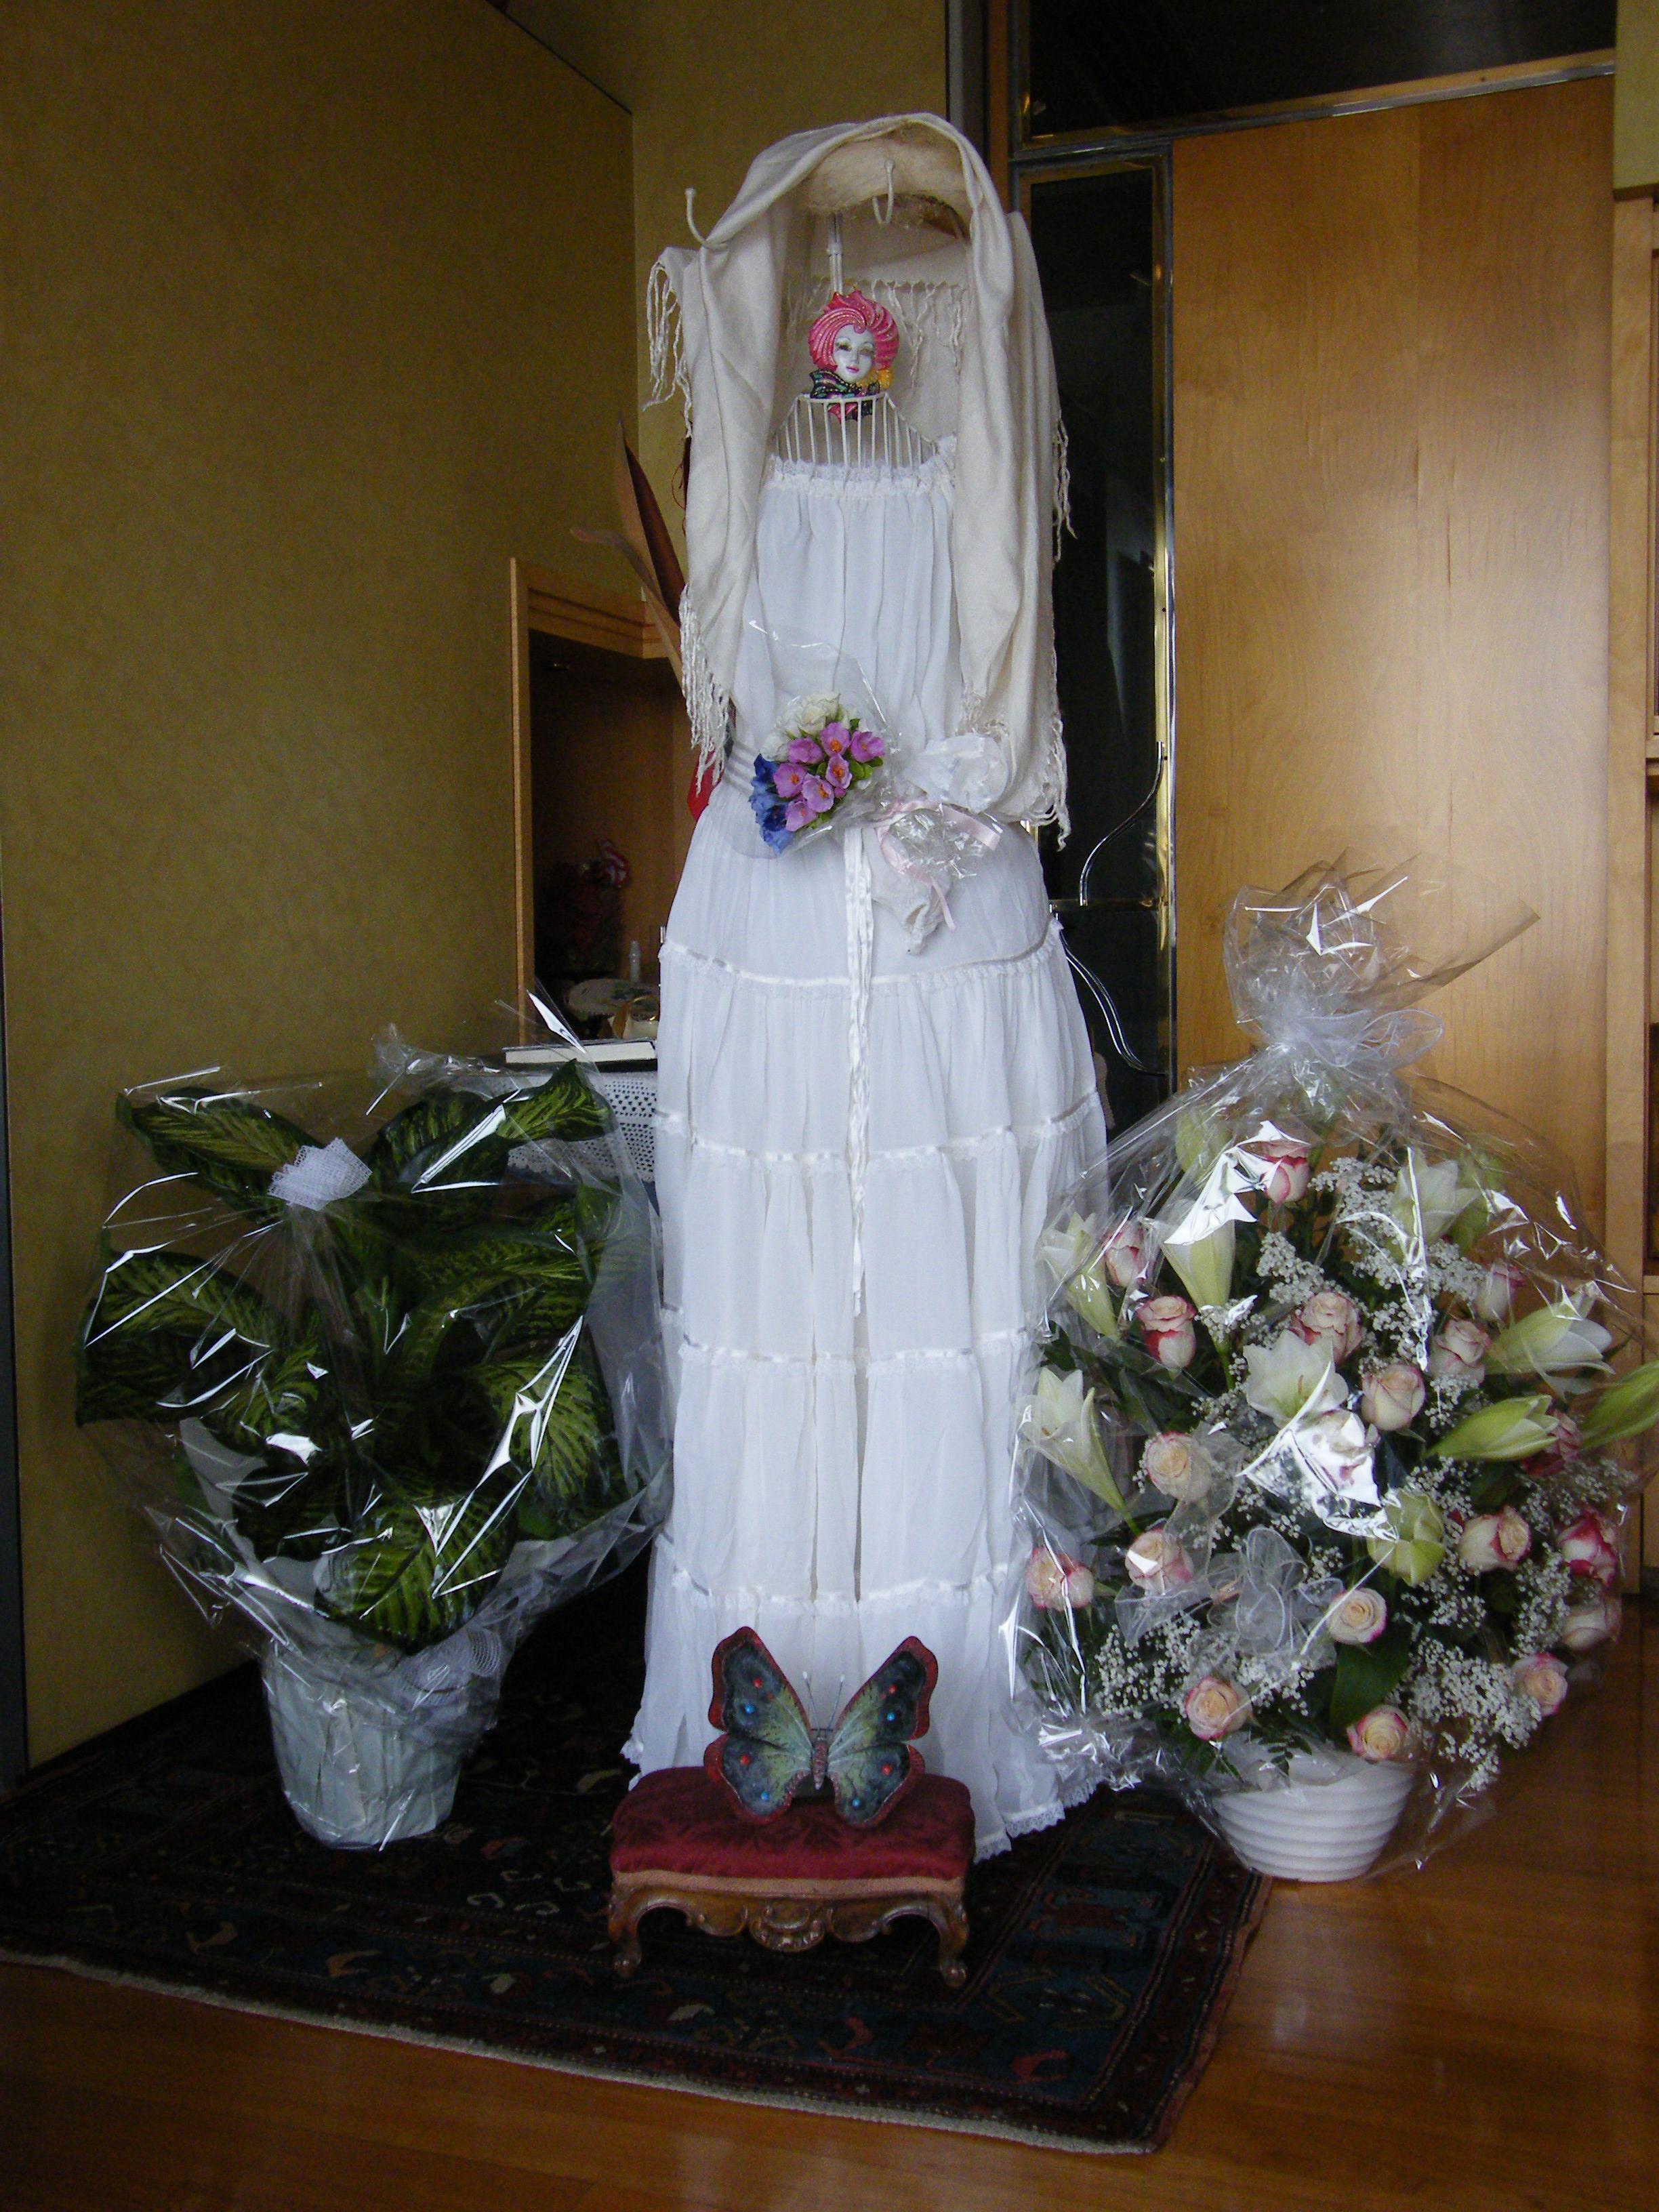 Bouquet Sposa Wikipedia.File The Bride Installation Jpg Wikimedia Commons